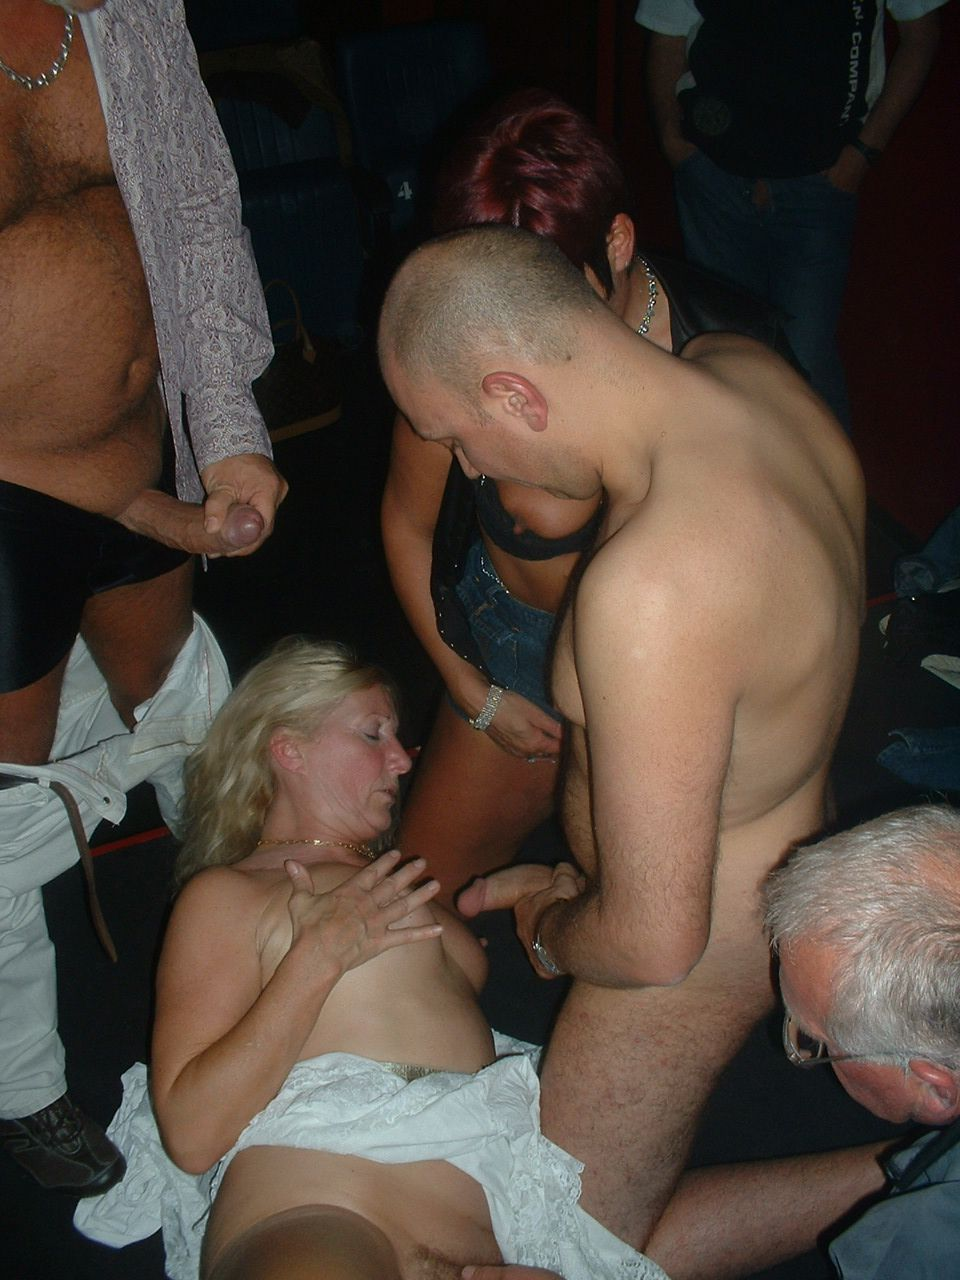 douche massage slavernij in Maastricht